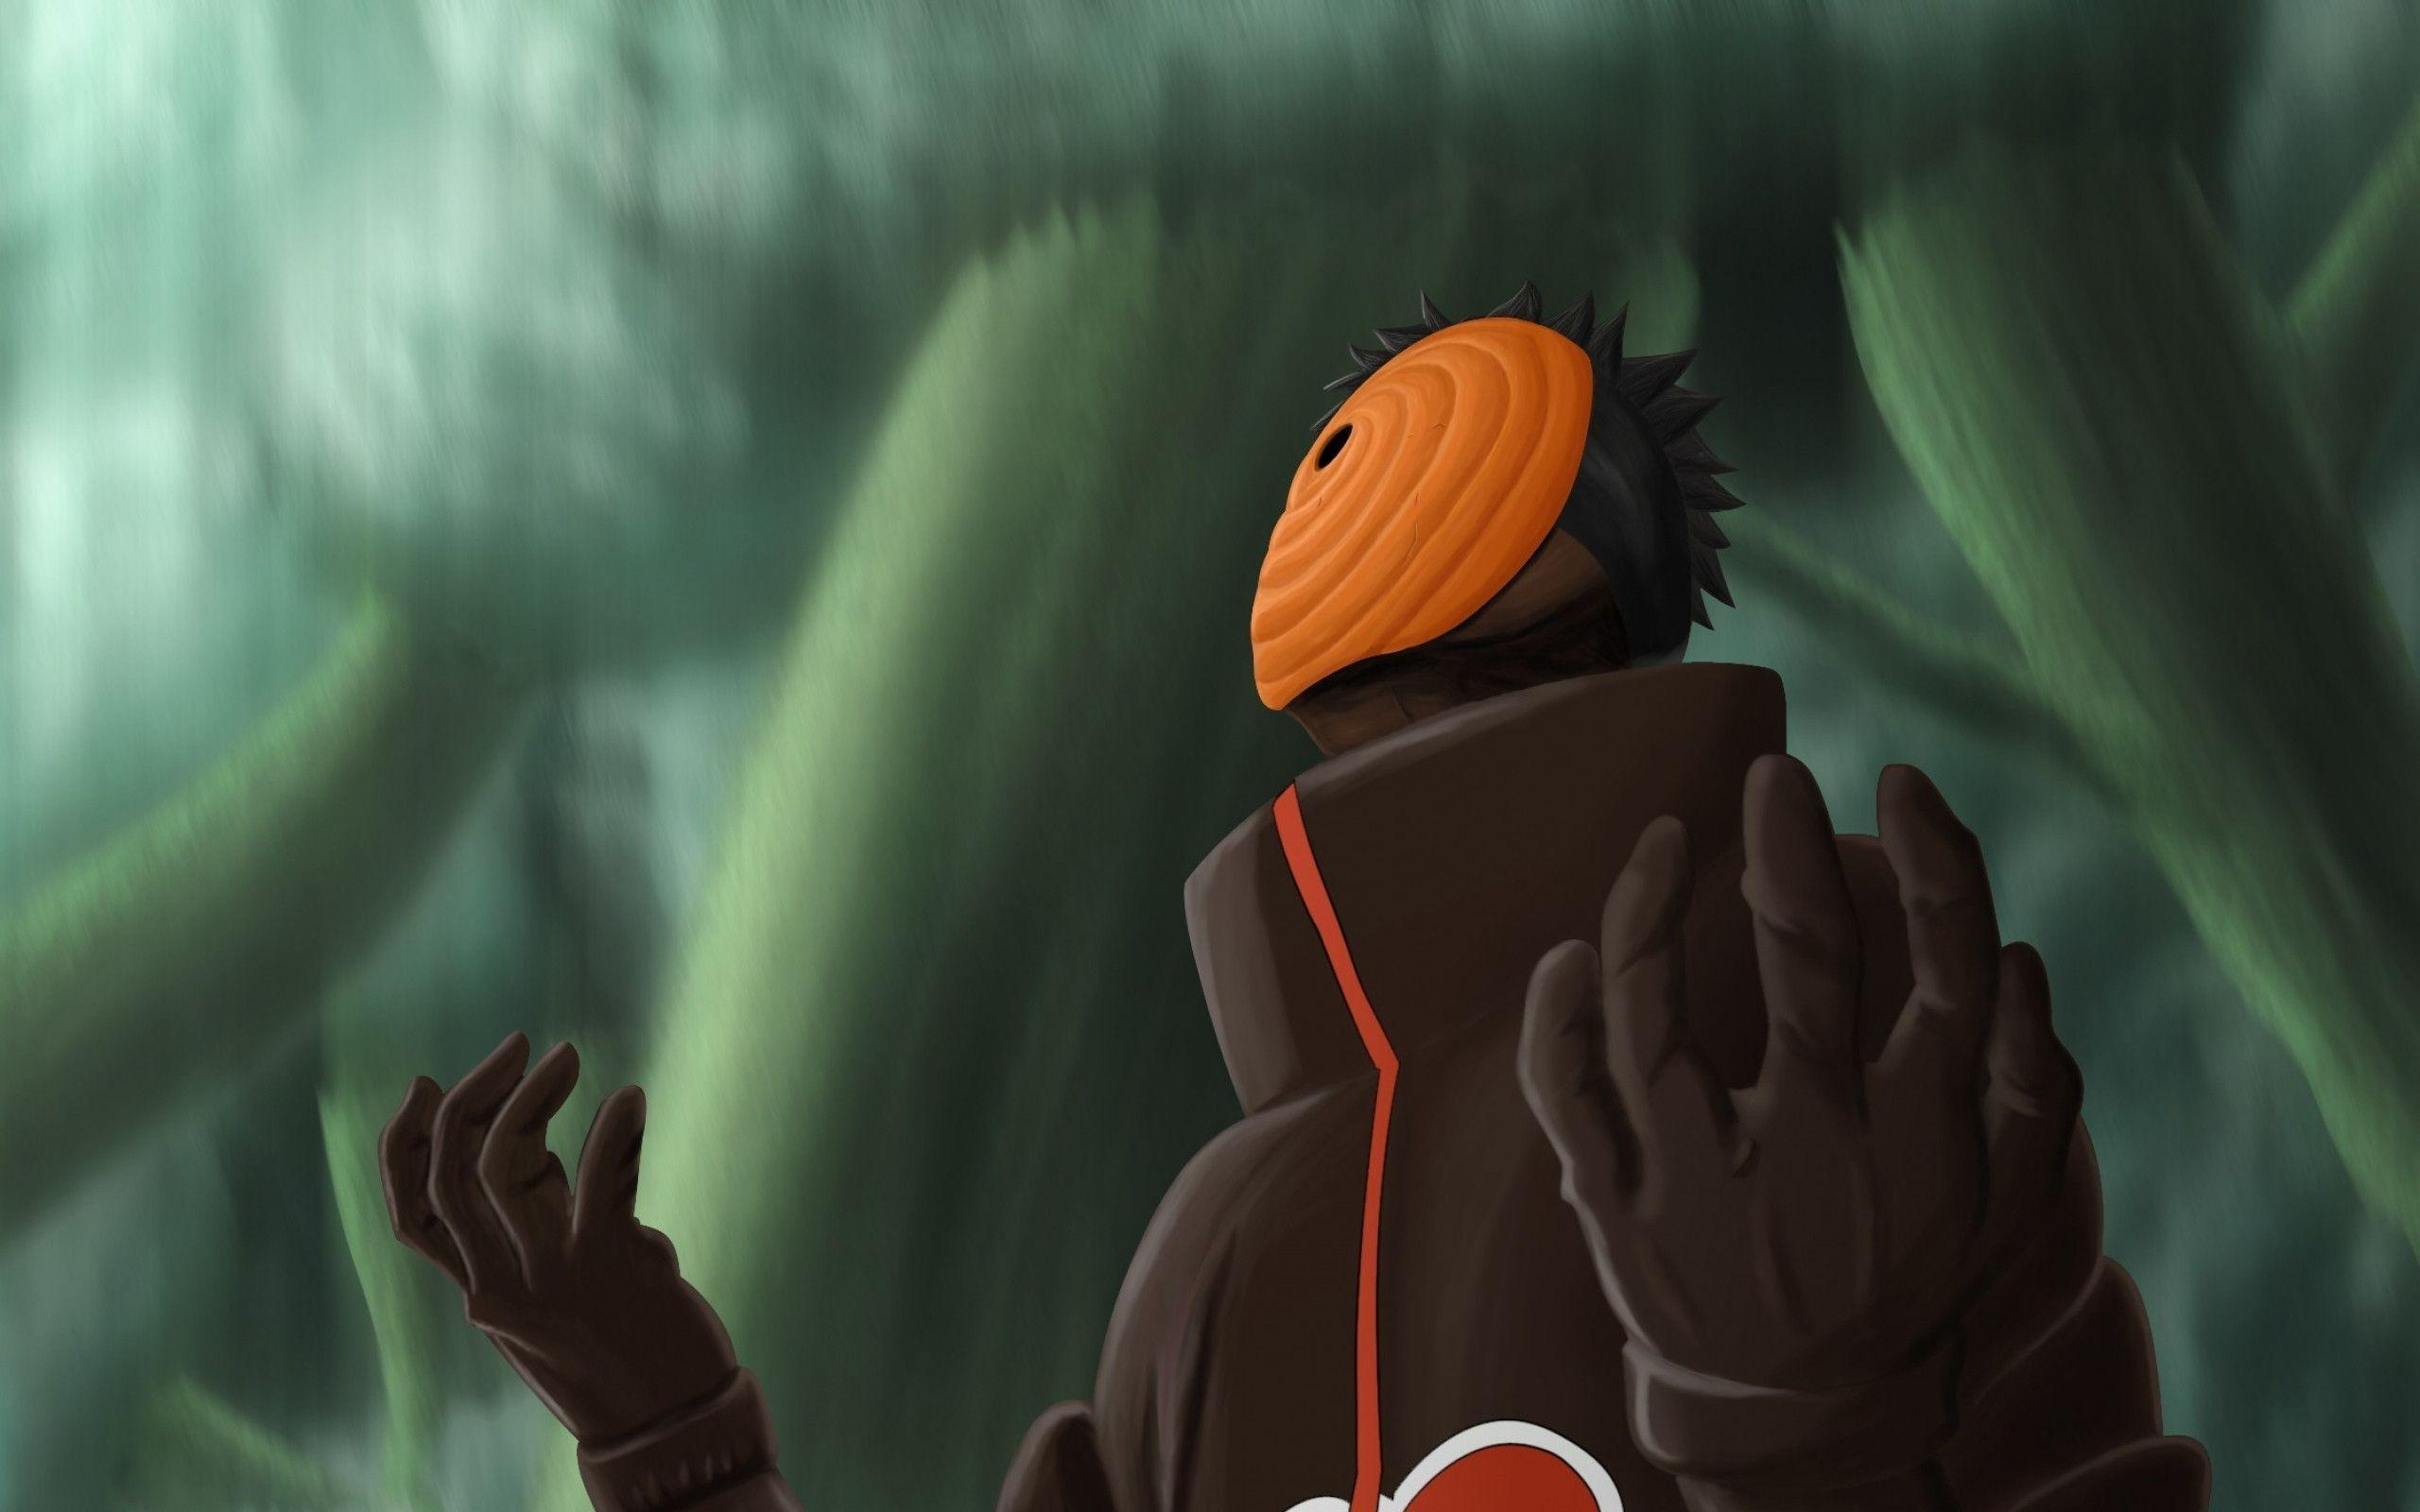 Tobi Naruto Wallpapers - Wallpaper Cave